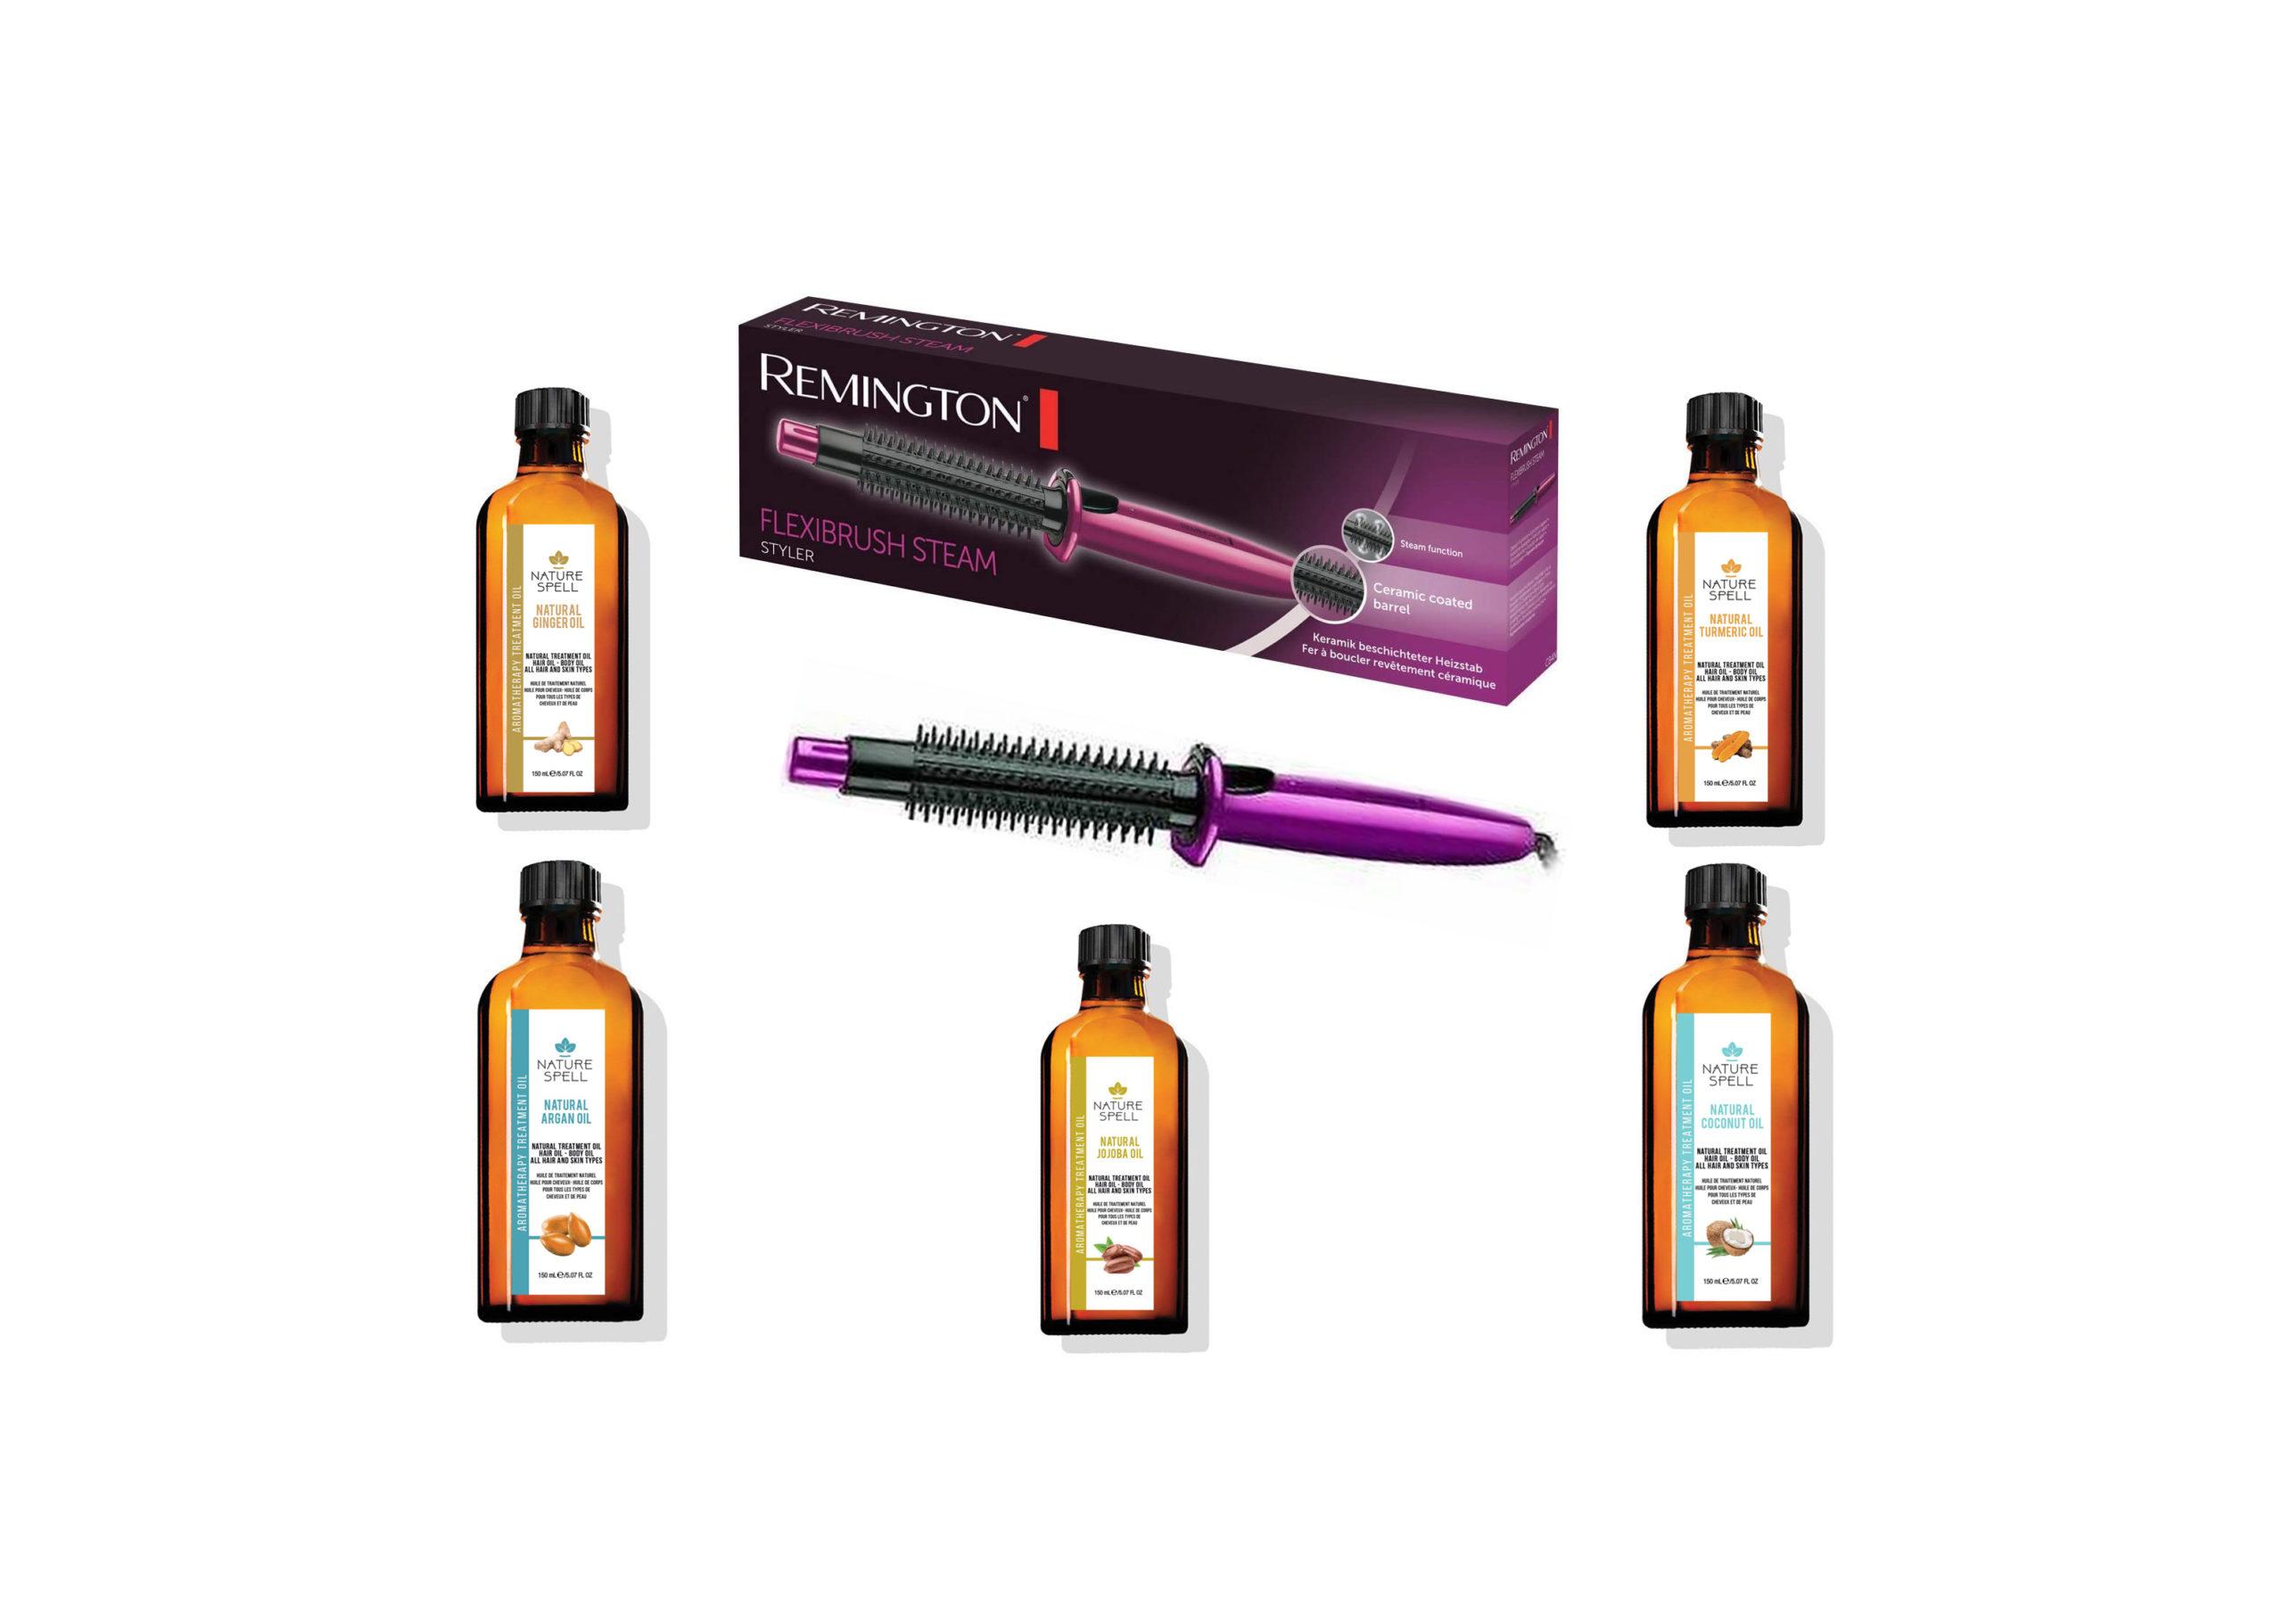 Remington Flexibrush Steam Styler CB4N With Choice of Nature Spell Hair Oil